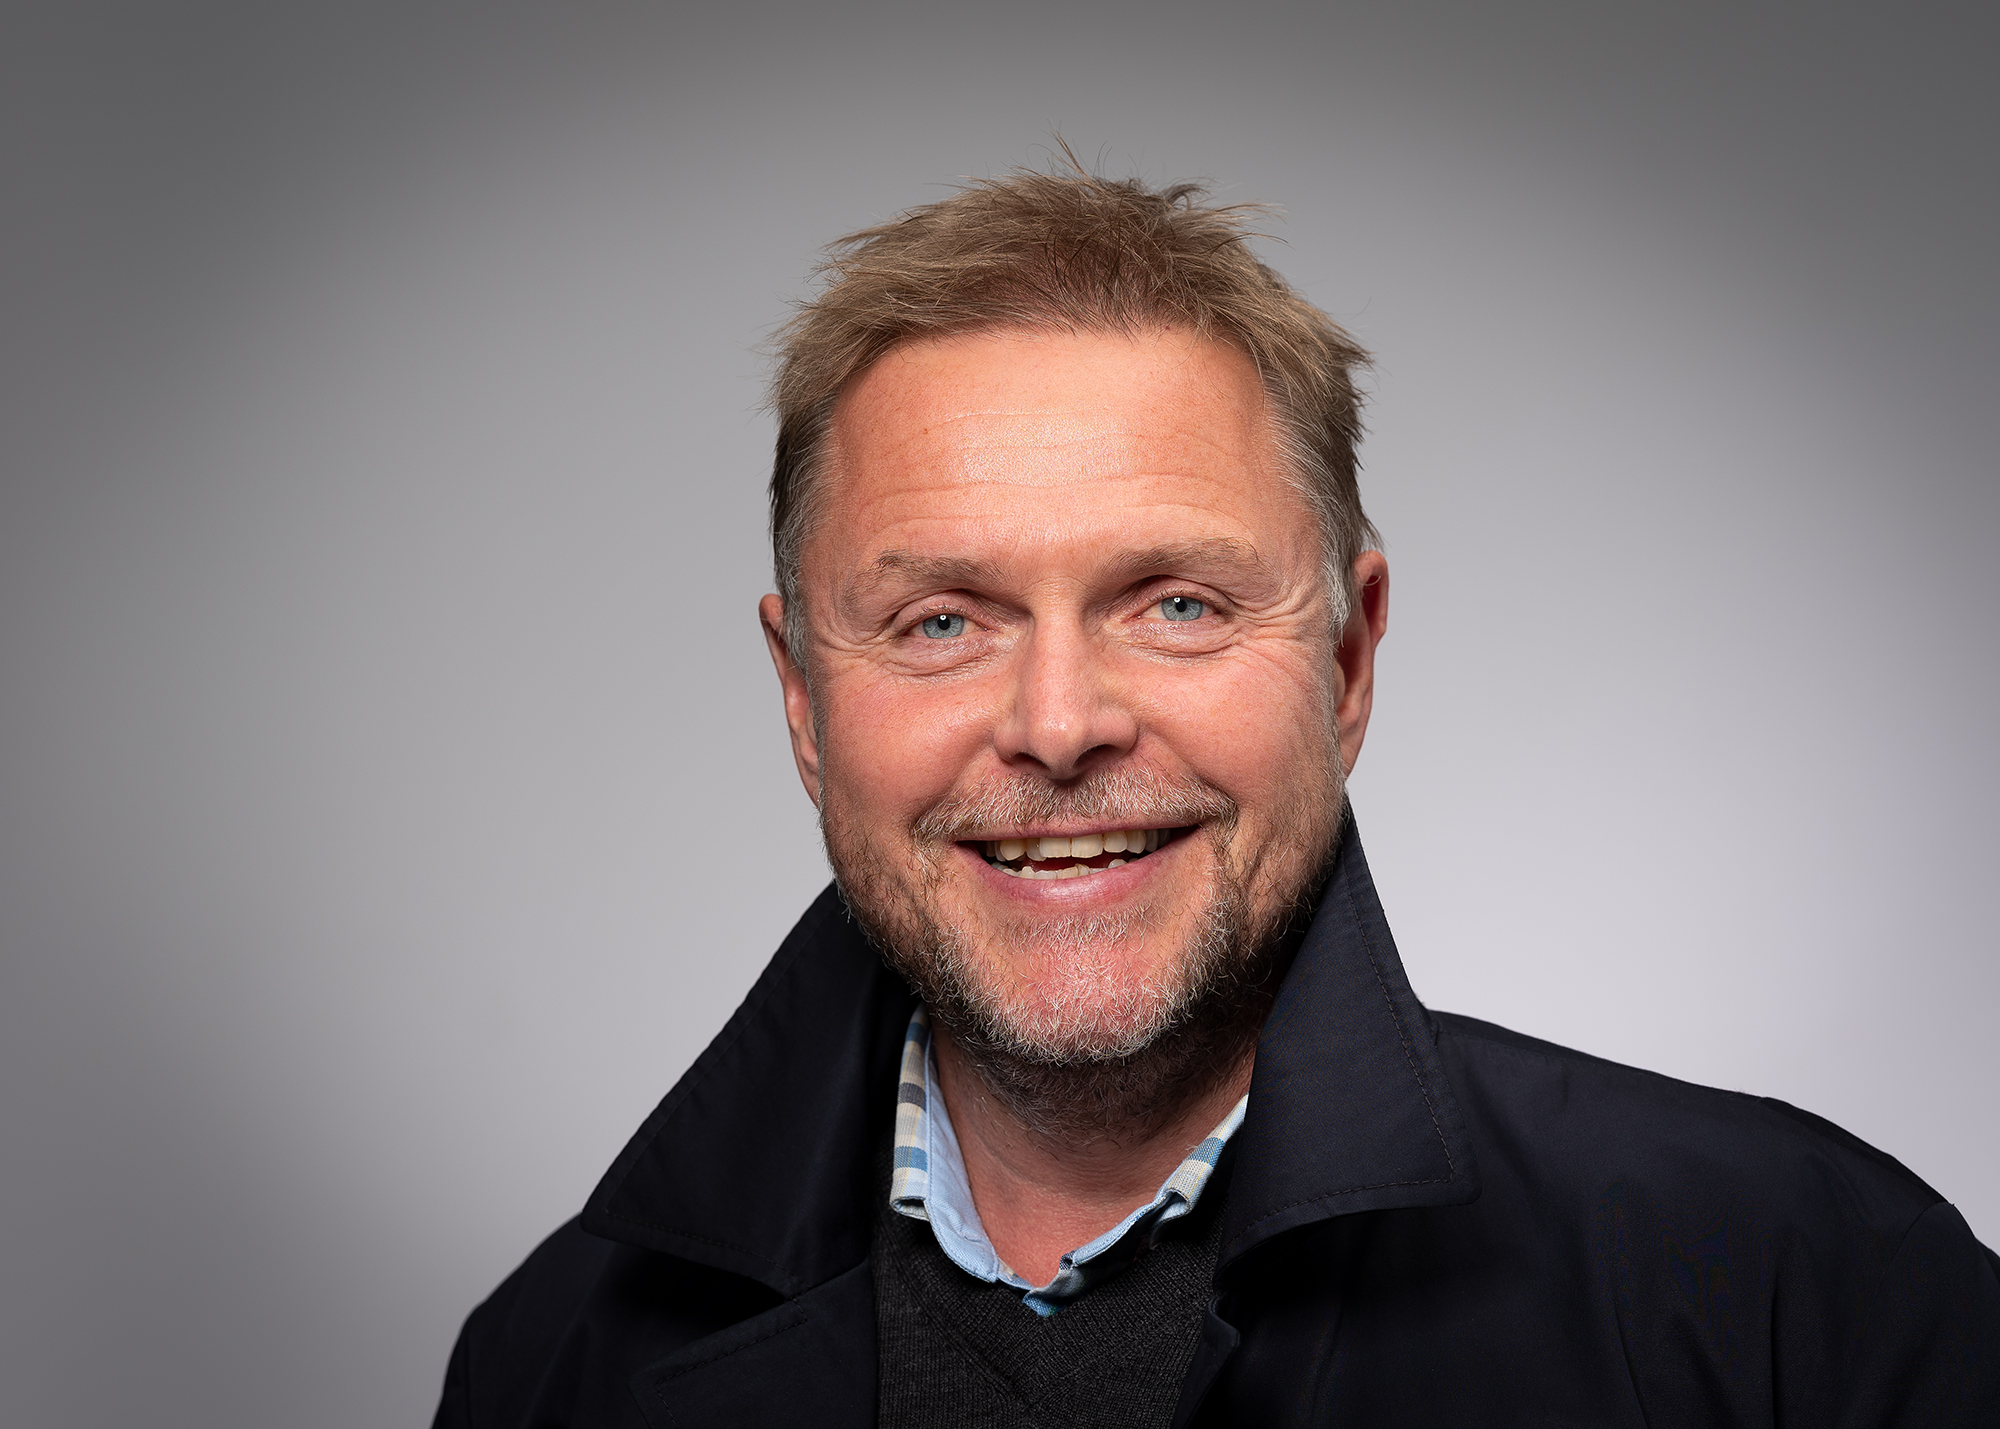 Tor Arne Borge